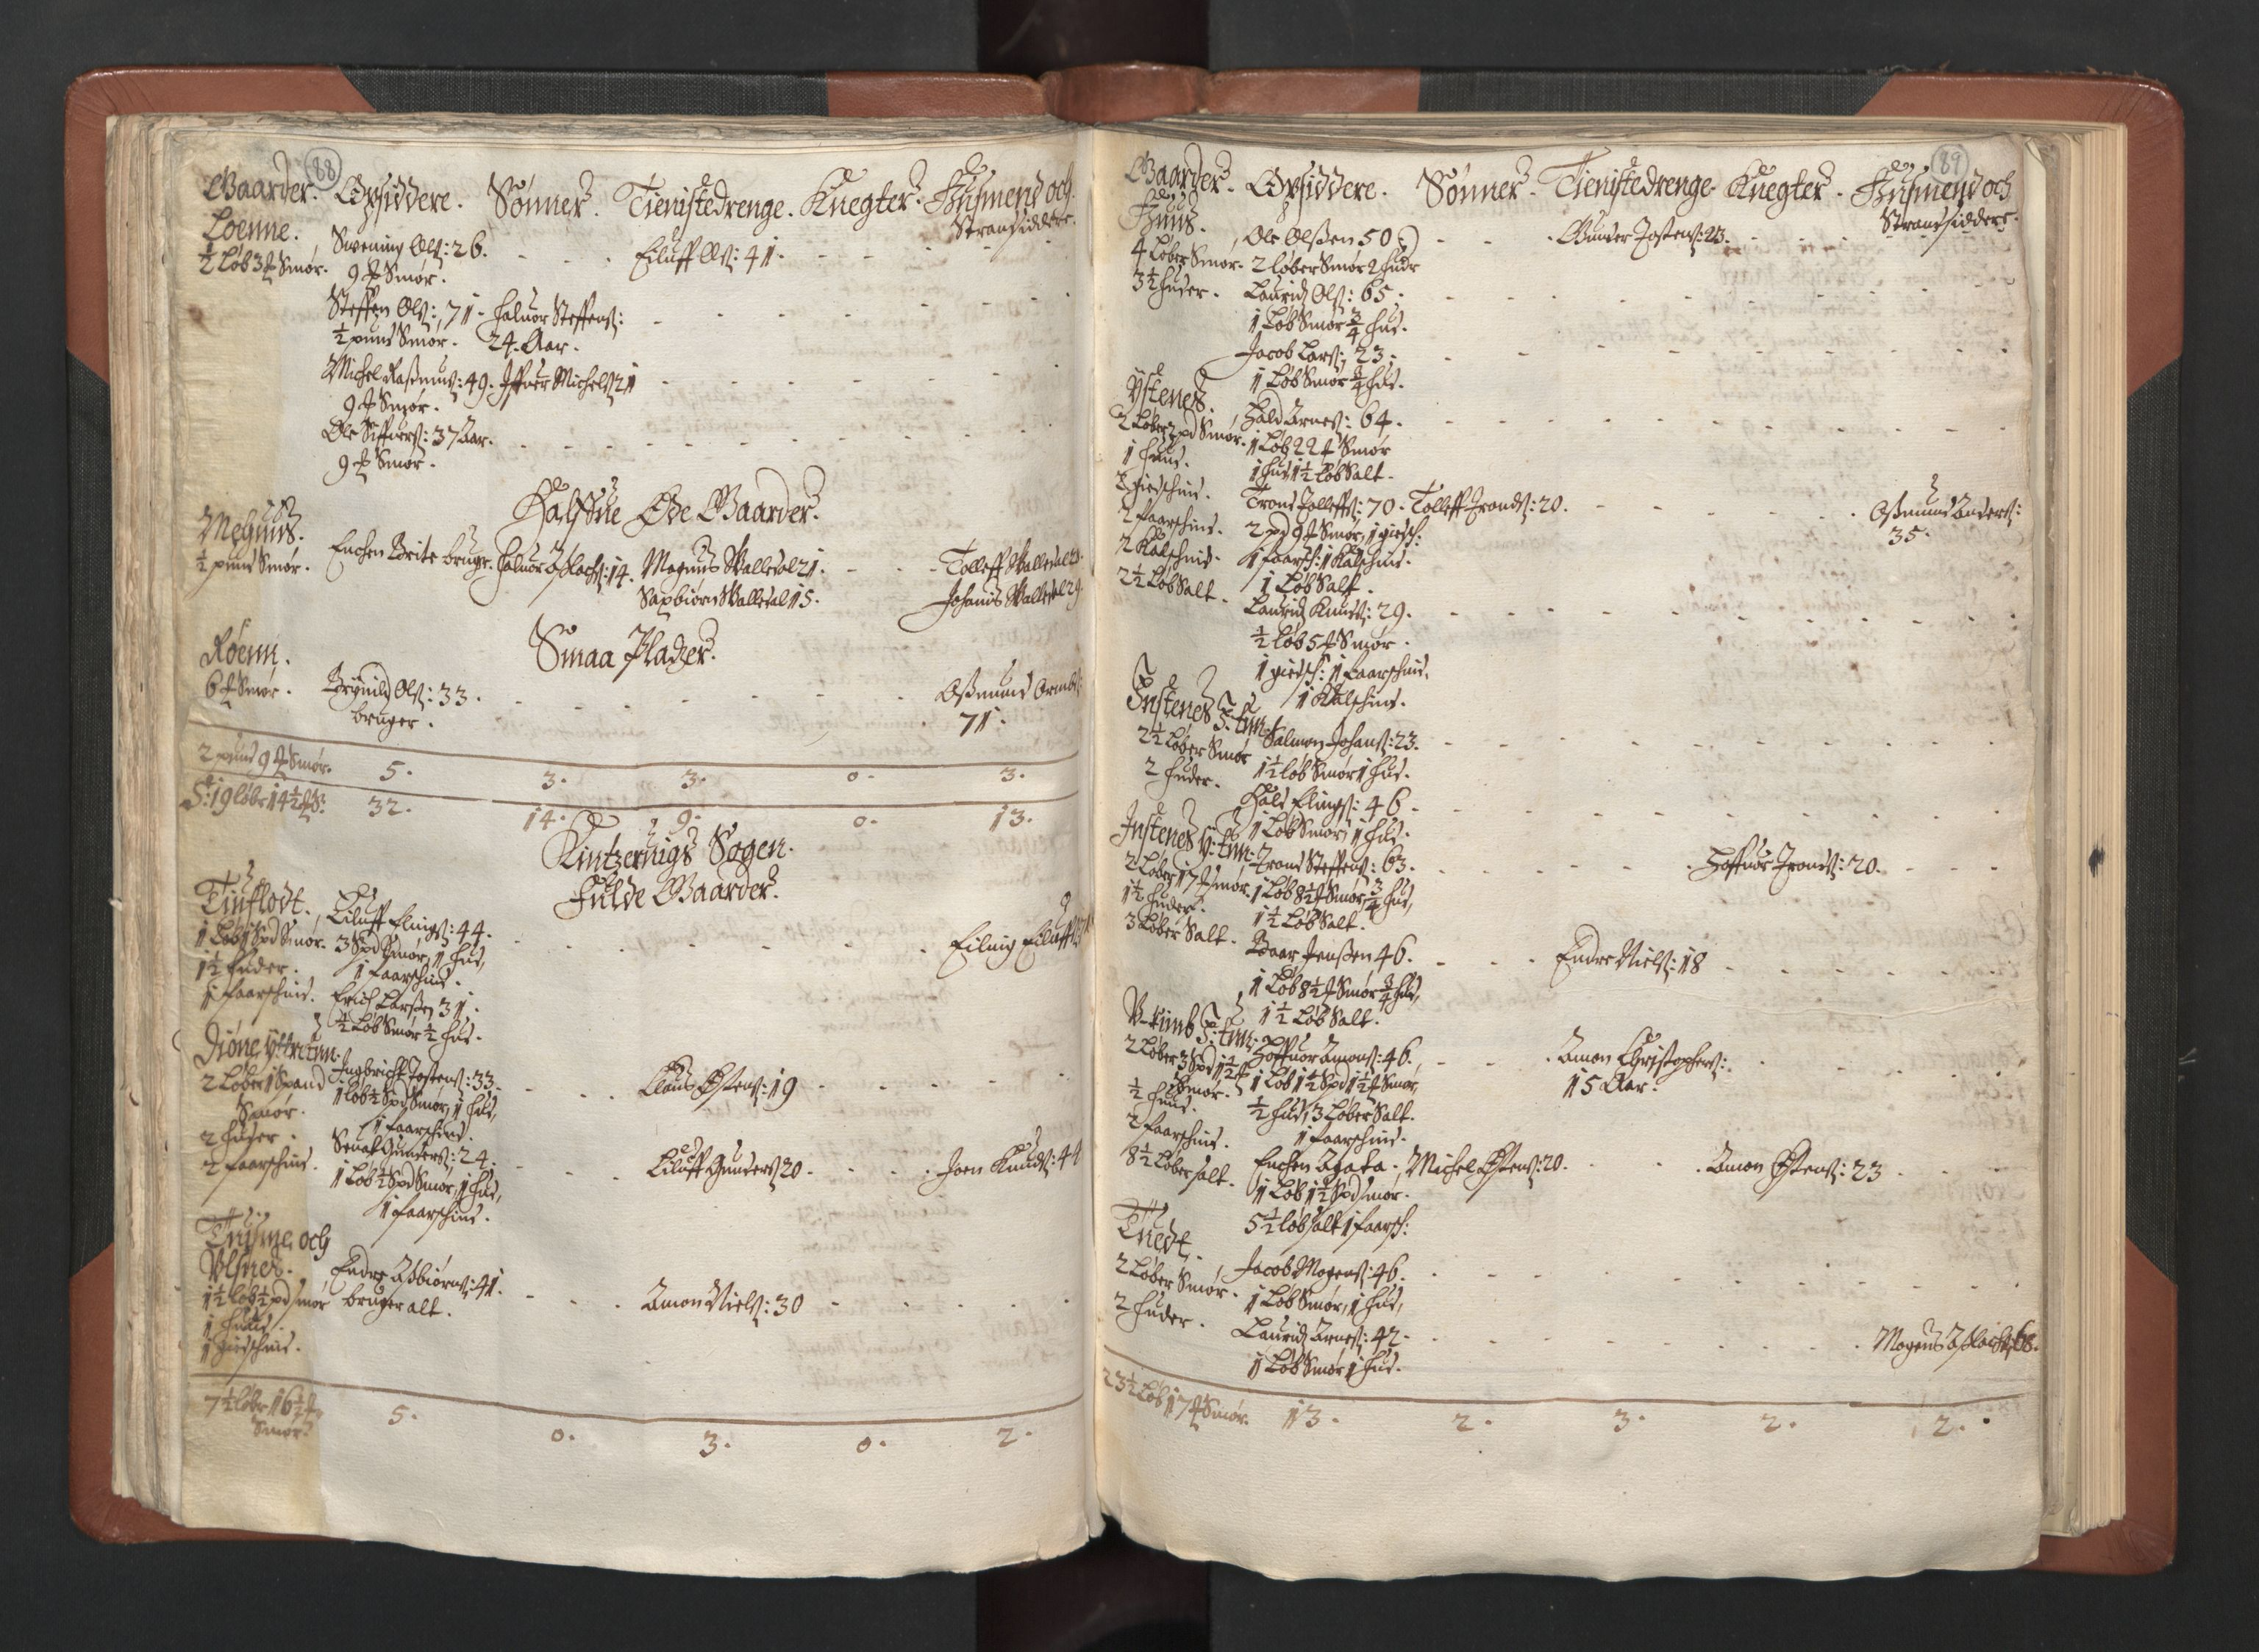 RA, Fogdenes og sorenskrivernes manntall 1664-1666, nr. 14: Hardanger len, Ytre Sogn fogderi og Indre Sogn fogderi, 1664-1665, s. 88-89